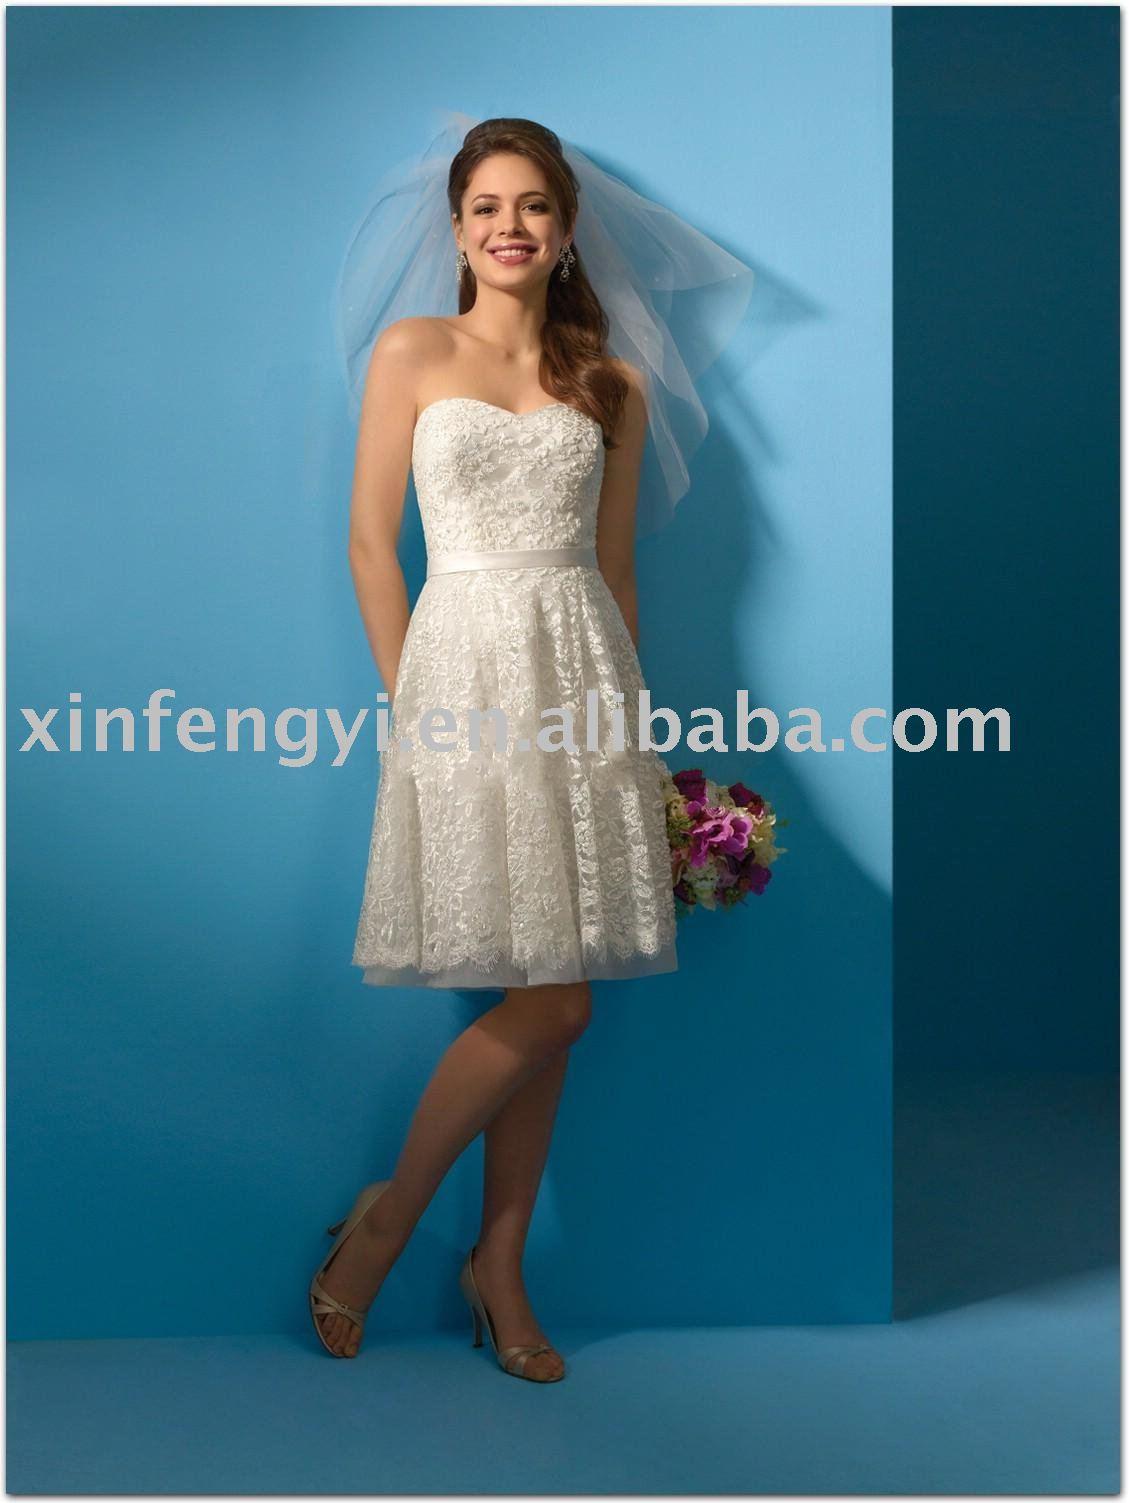 Wedding dress style: Wedding dress short length